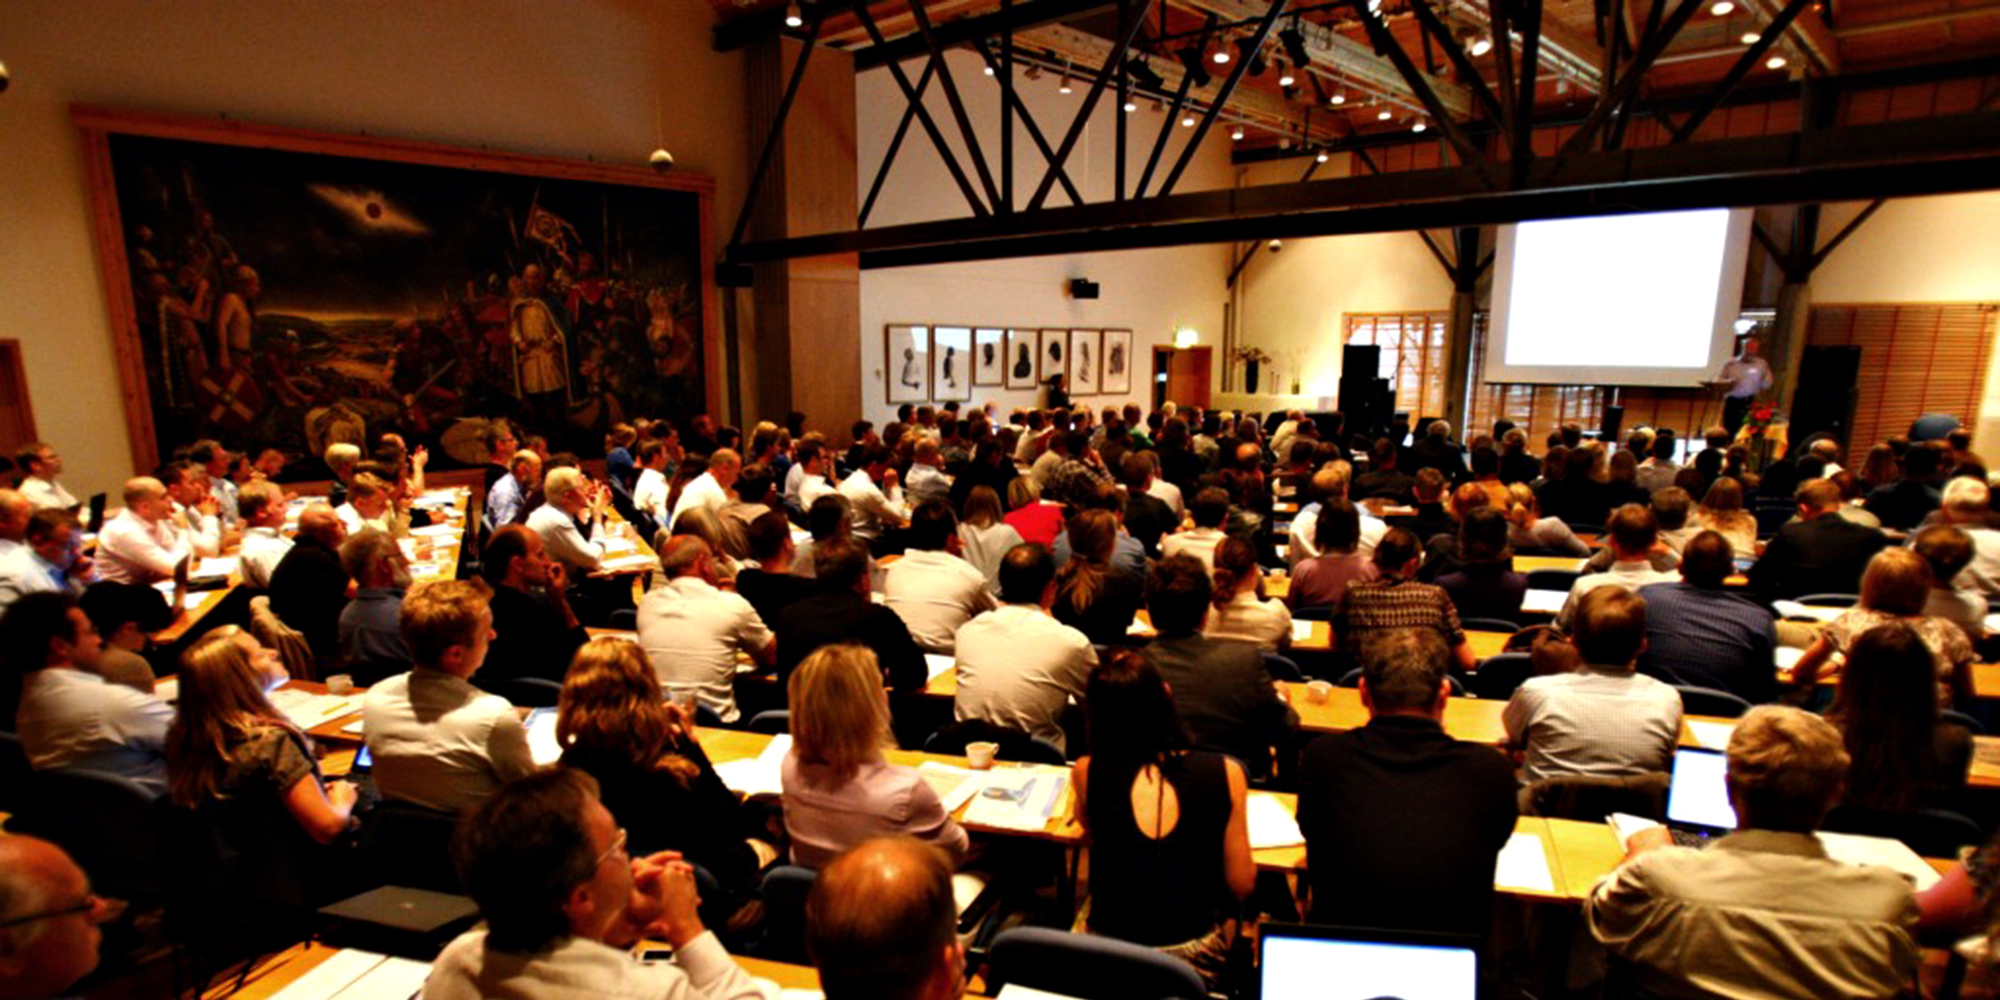 Stiklestad Hotell - conference room - Konferansesalen 1030. Copyright: Stiklestad Hotell